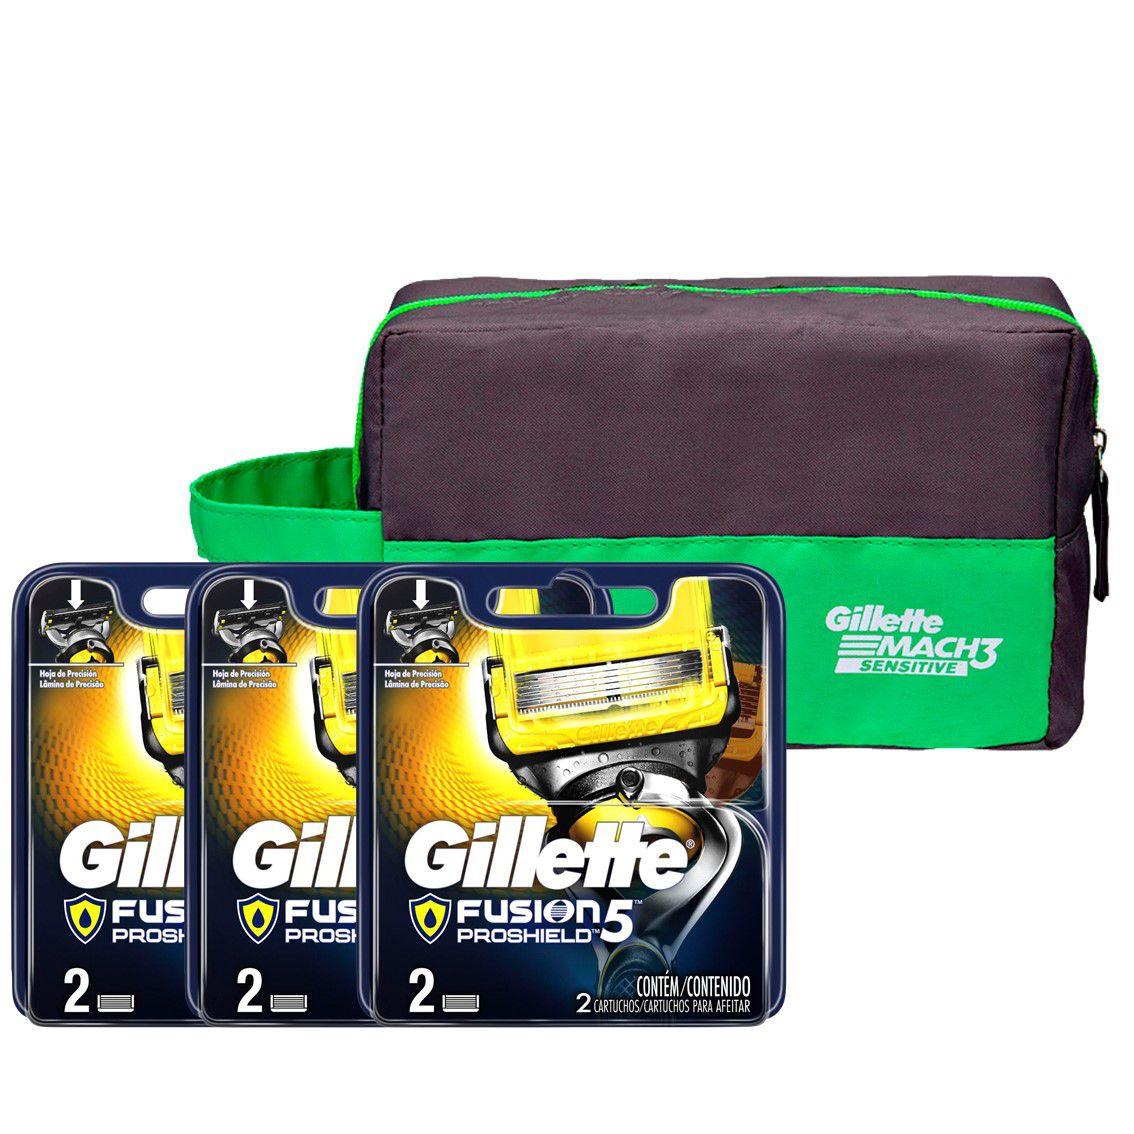 Kit 6 Cargas Gillette Aparelho de Barbear Fusion Proshield + Necessaire